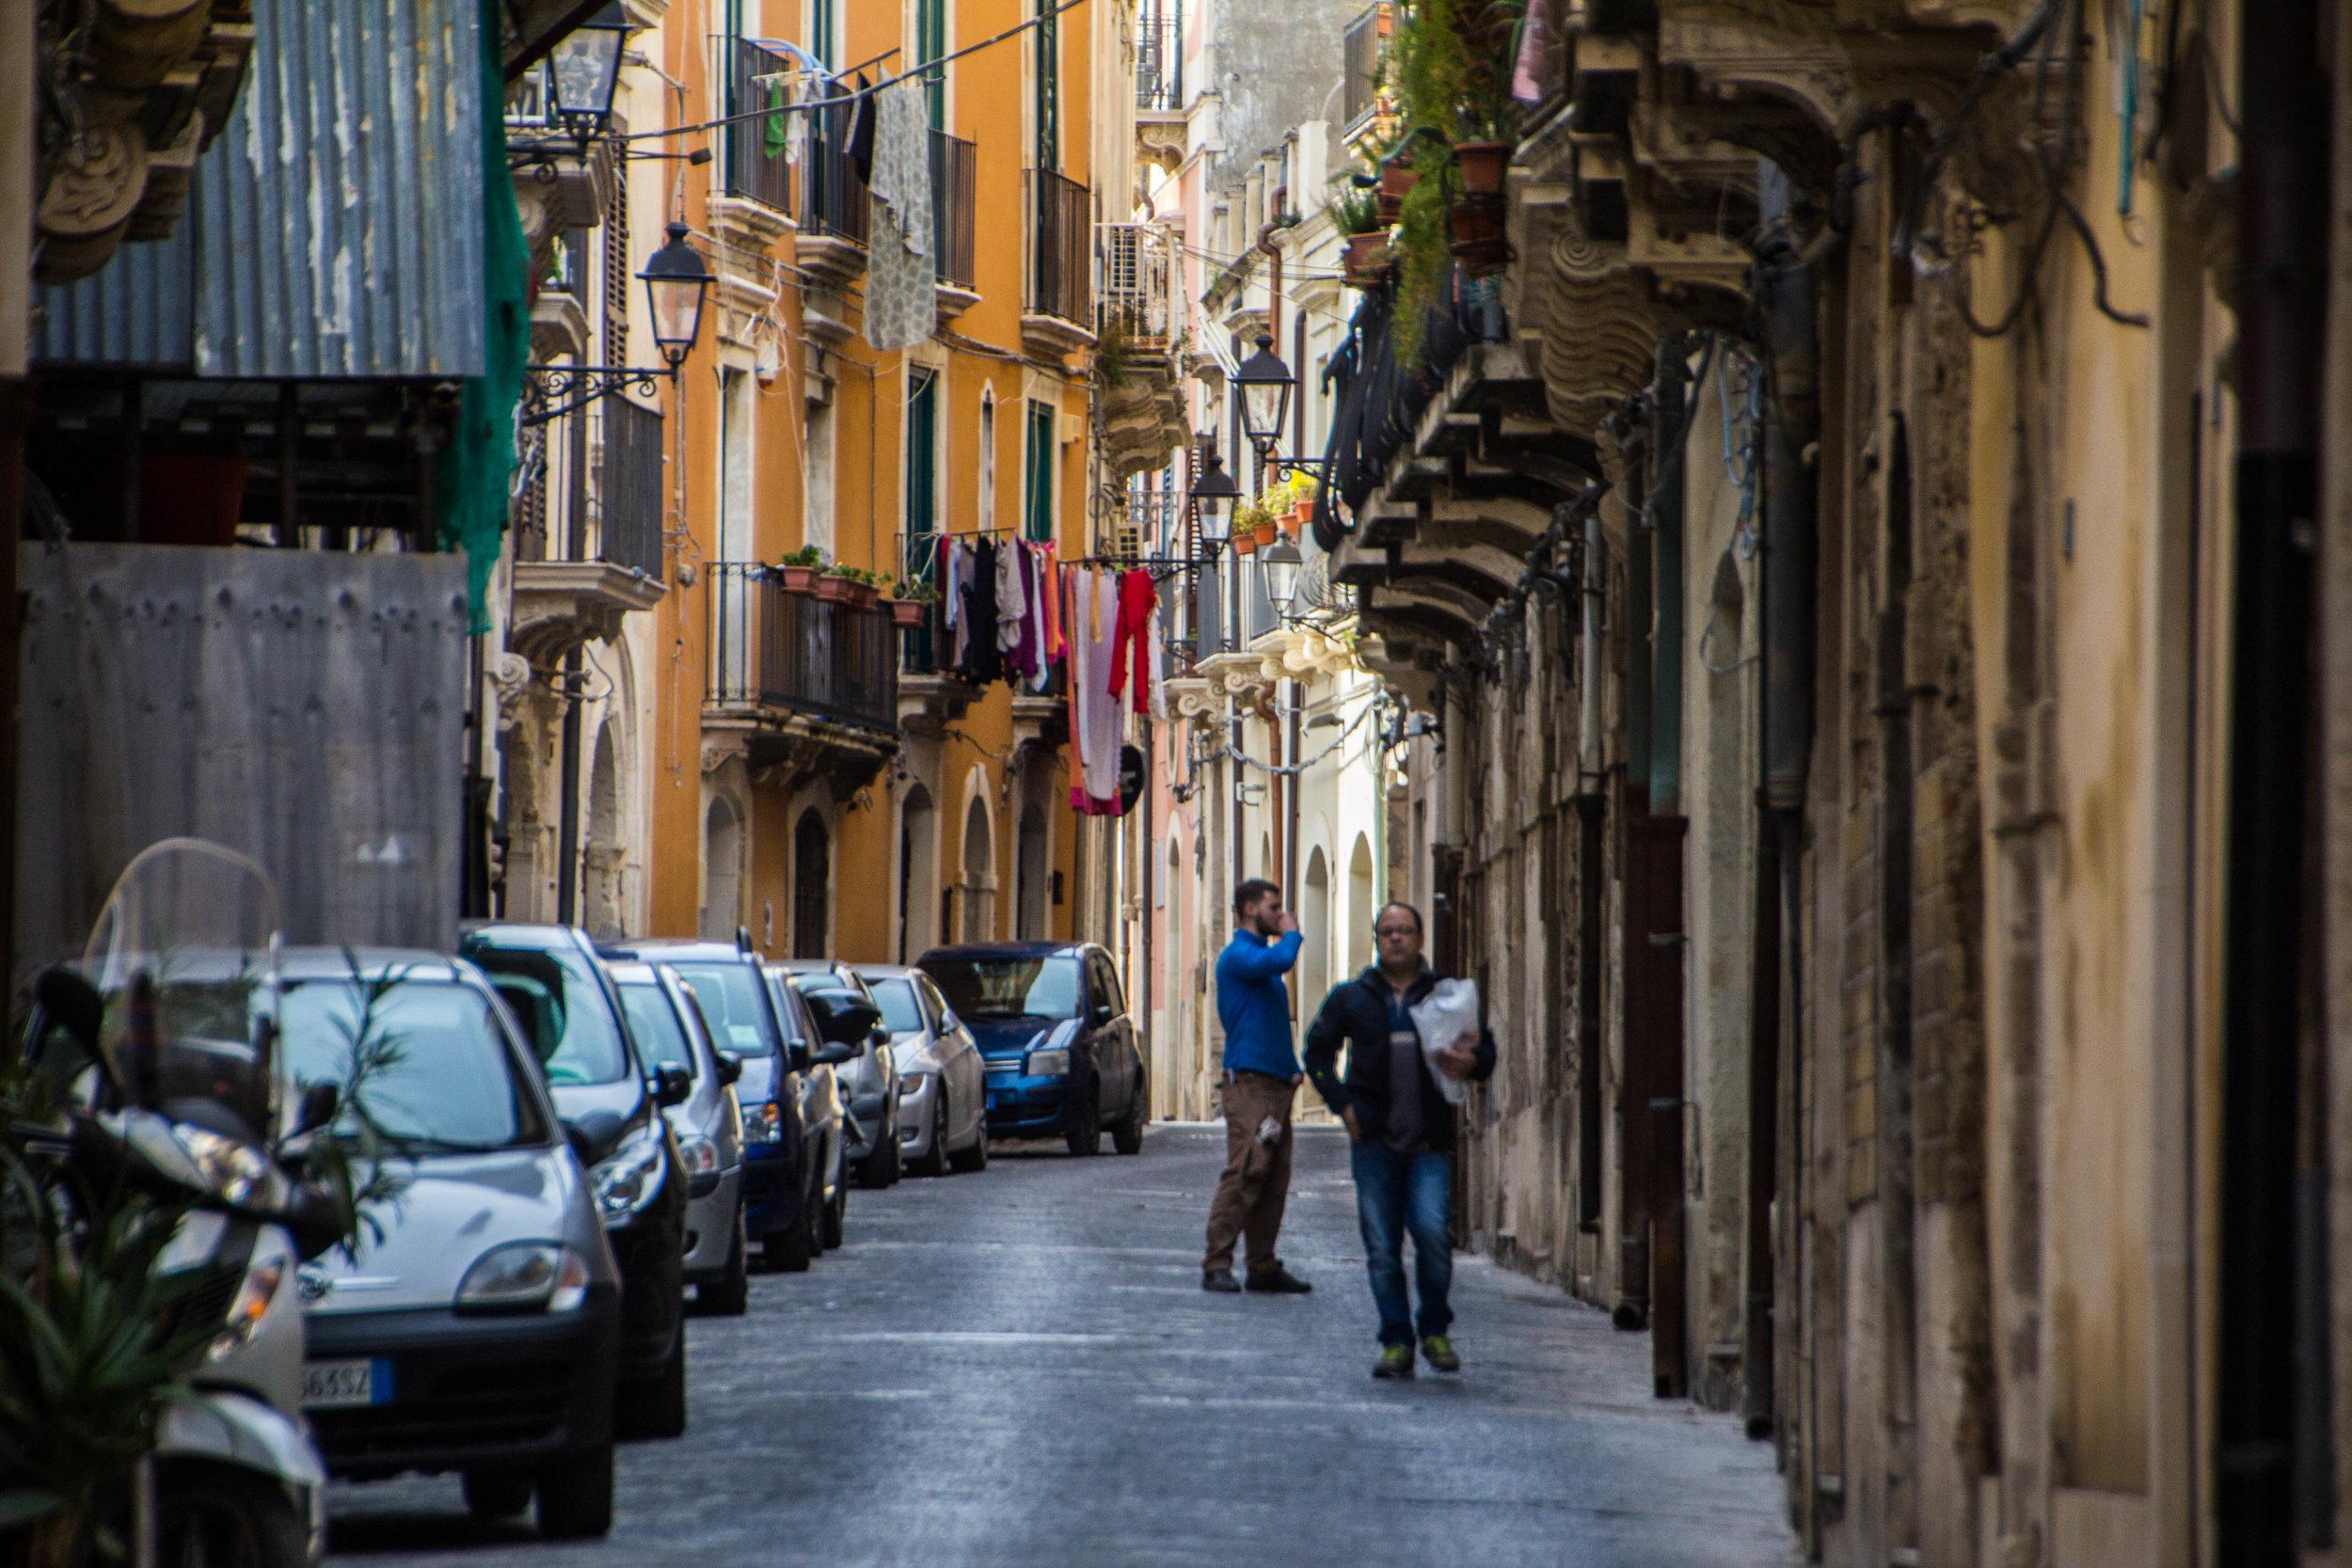 streets-ortygia-syracuse-sicily-33.jpg